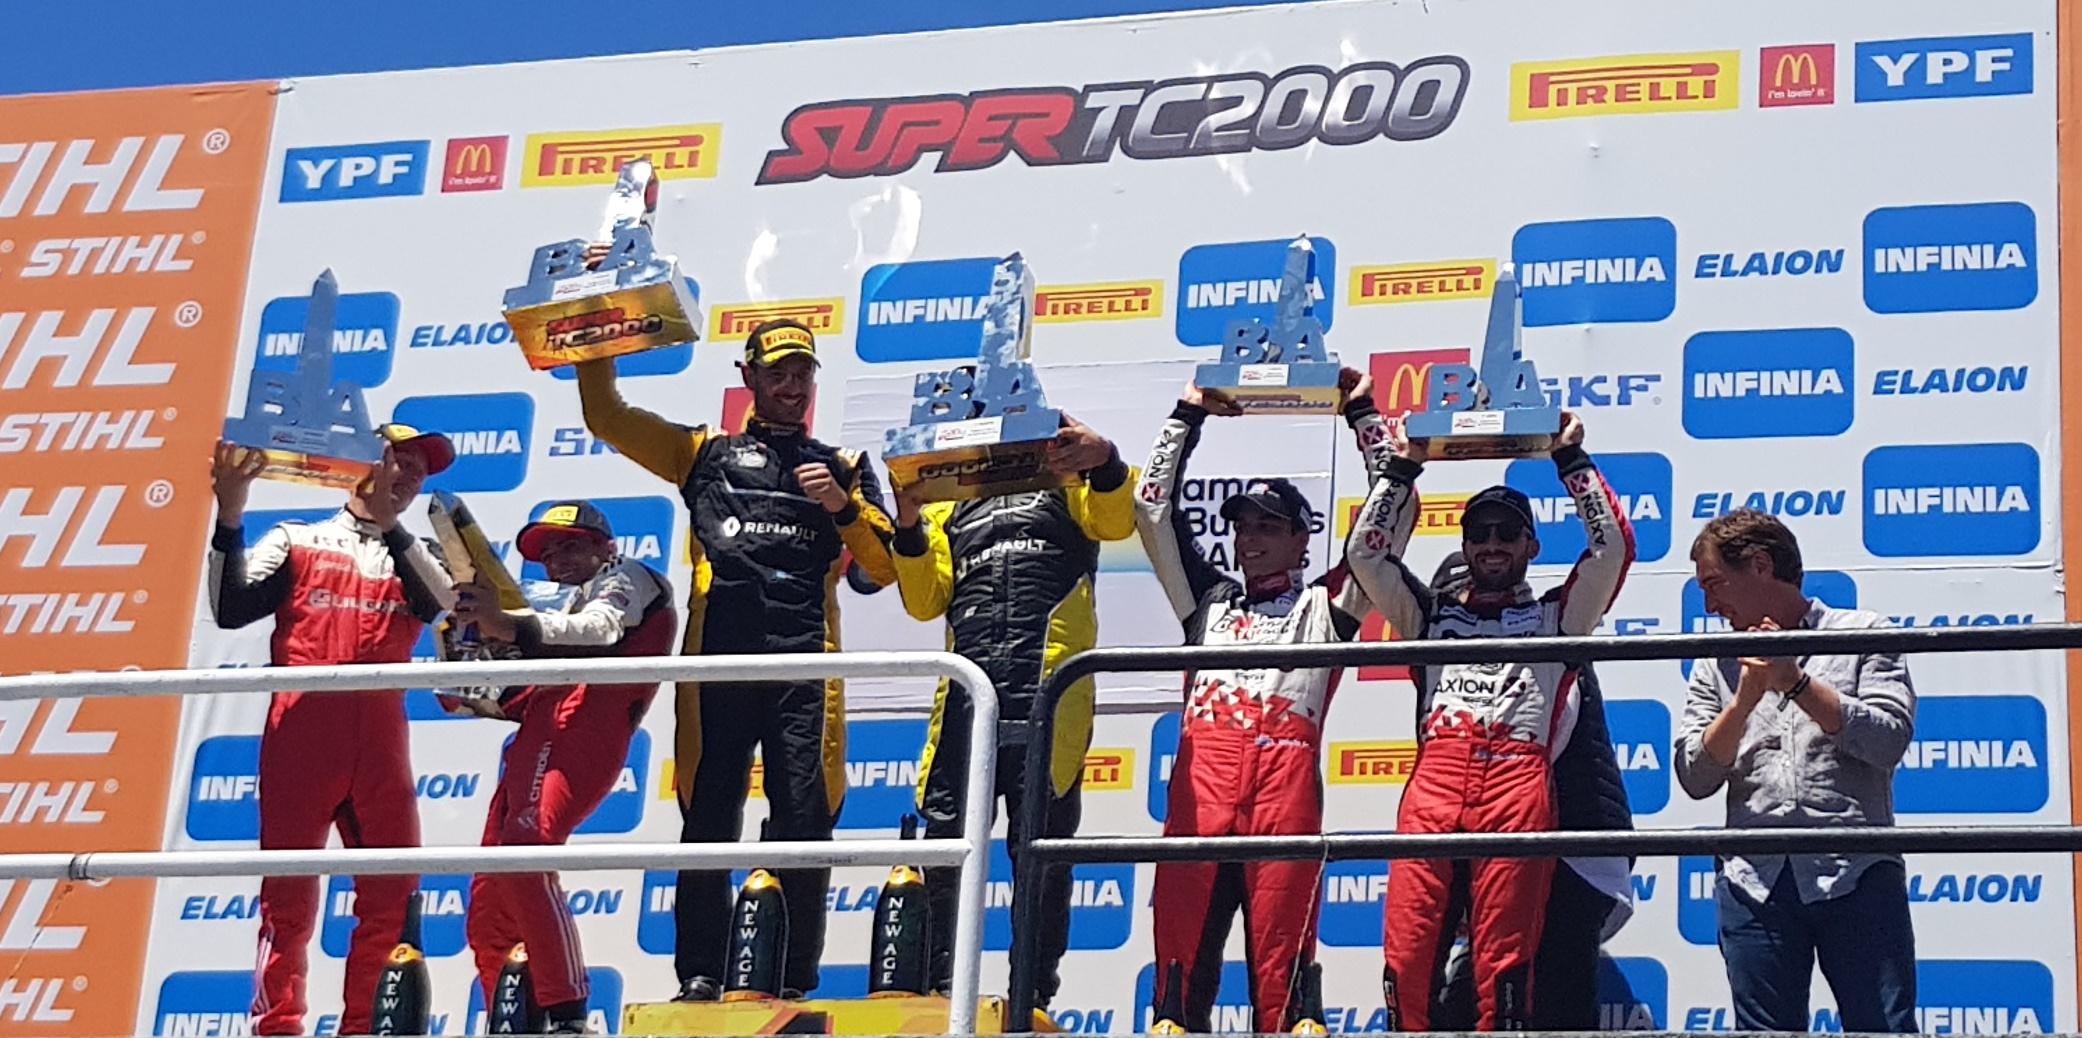 super_tc2000-podio-soymotor.jpg